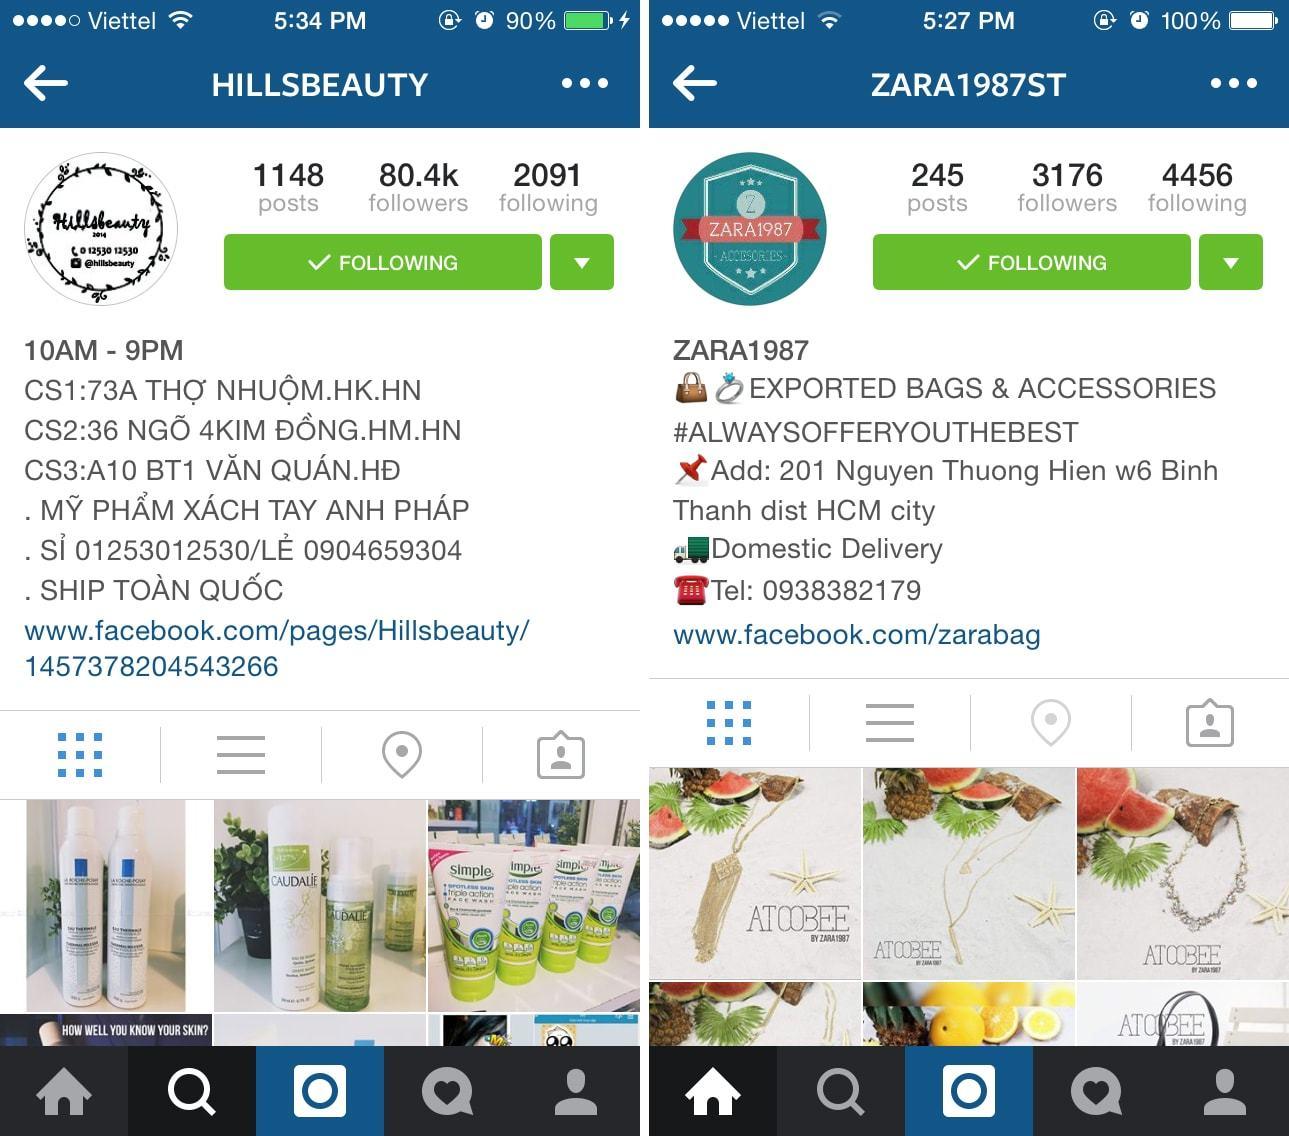 tăng follower trên instagram